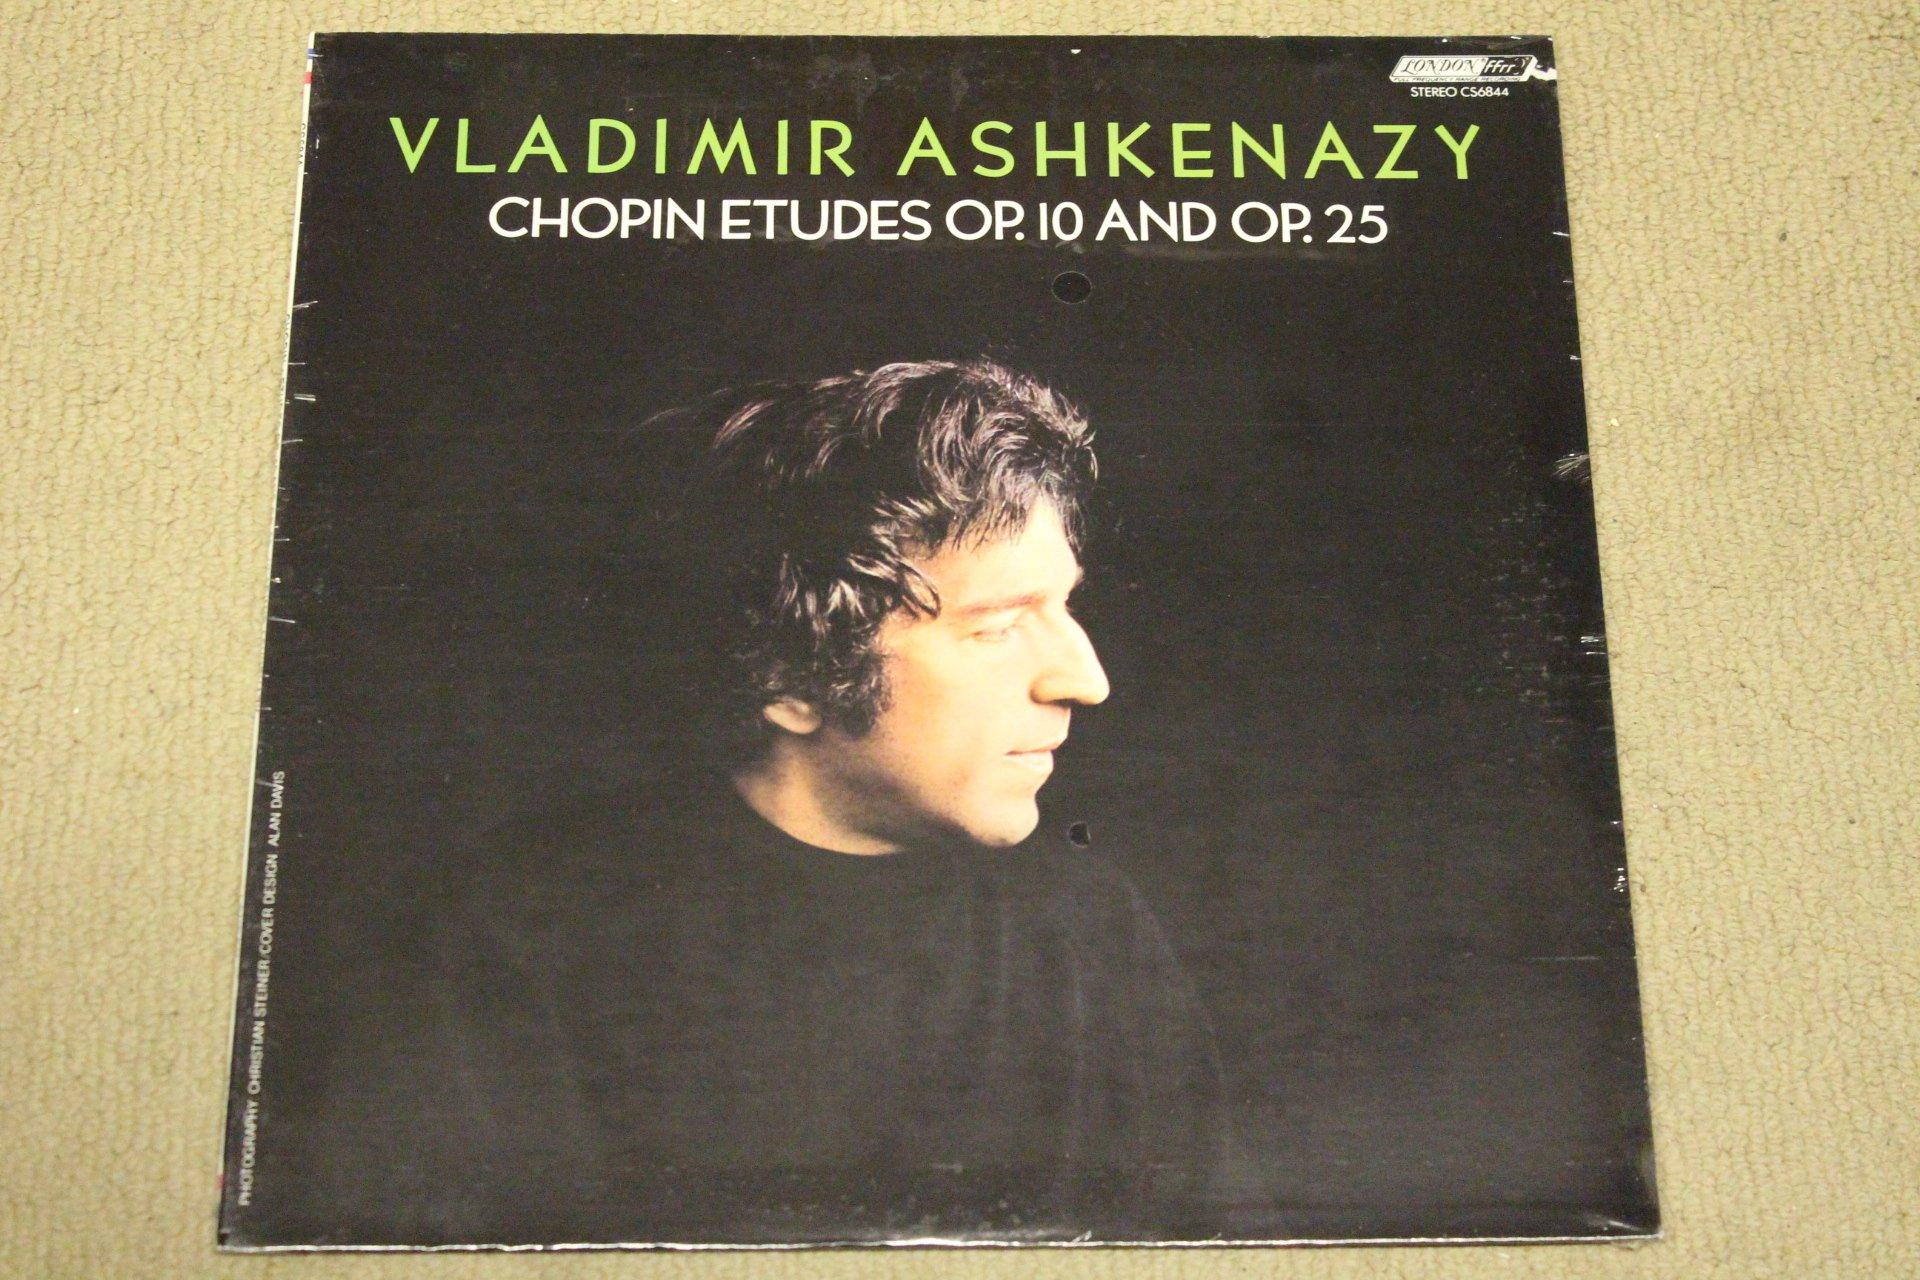 Chopin Etudes Op.10 and Op.25